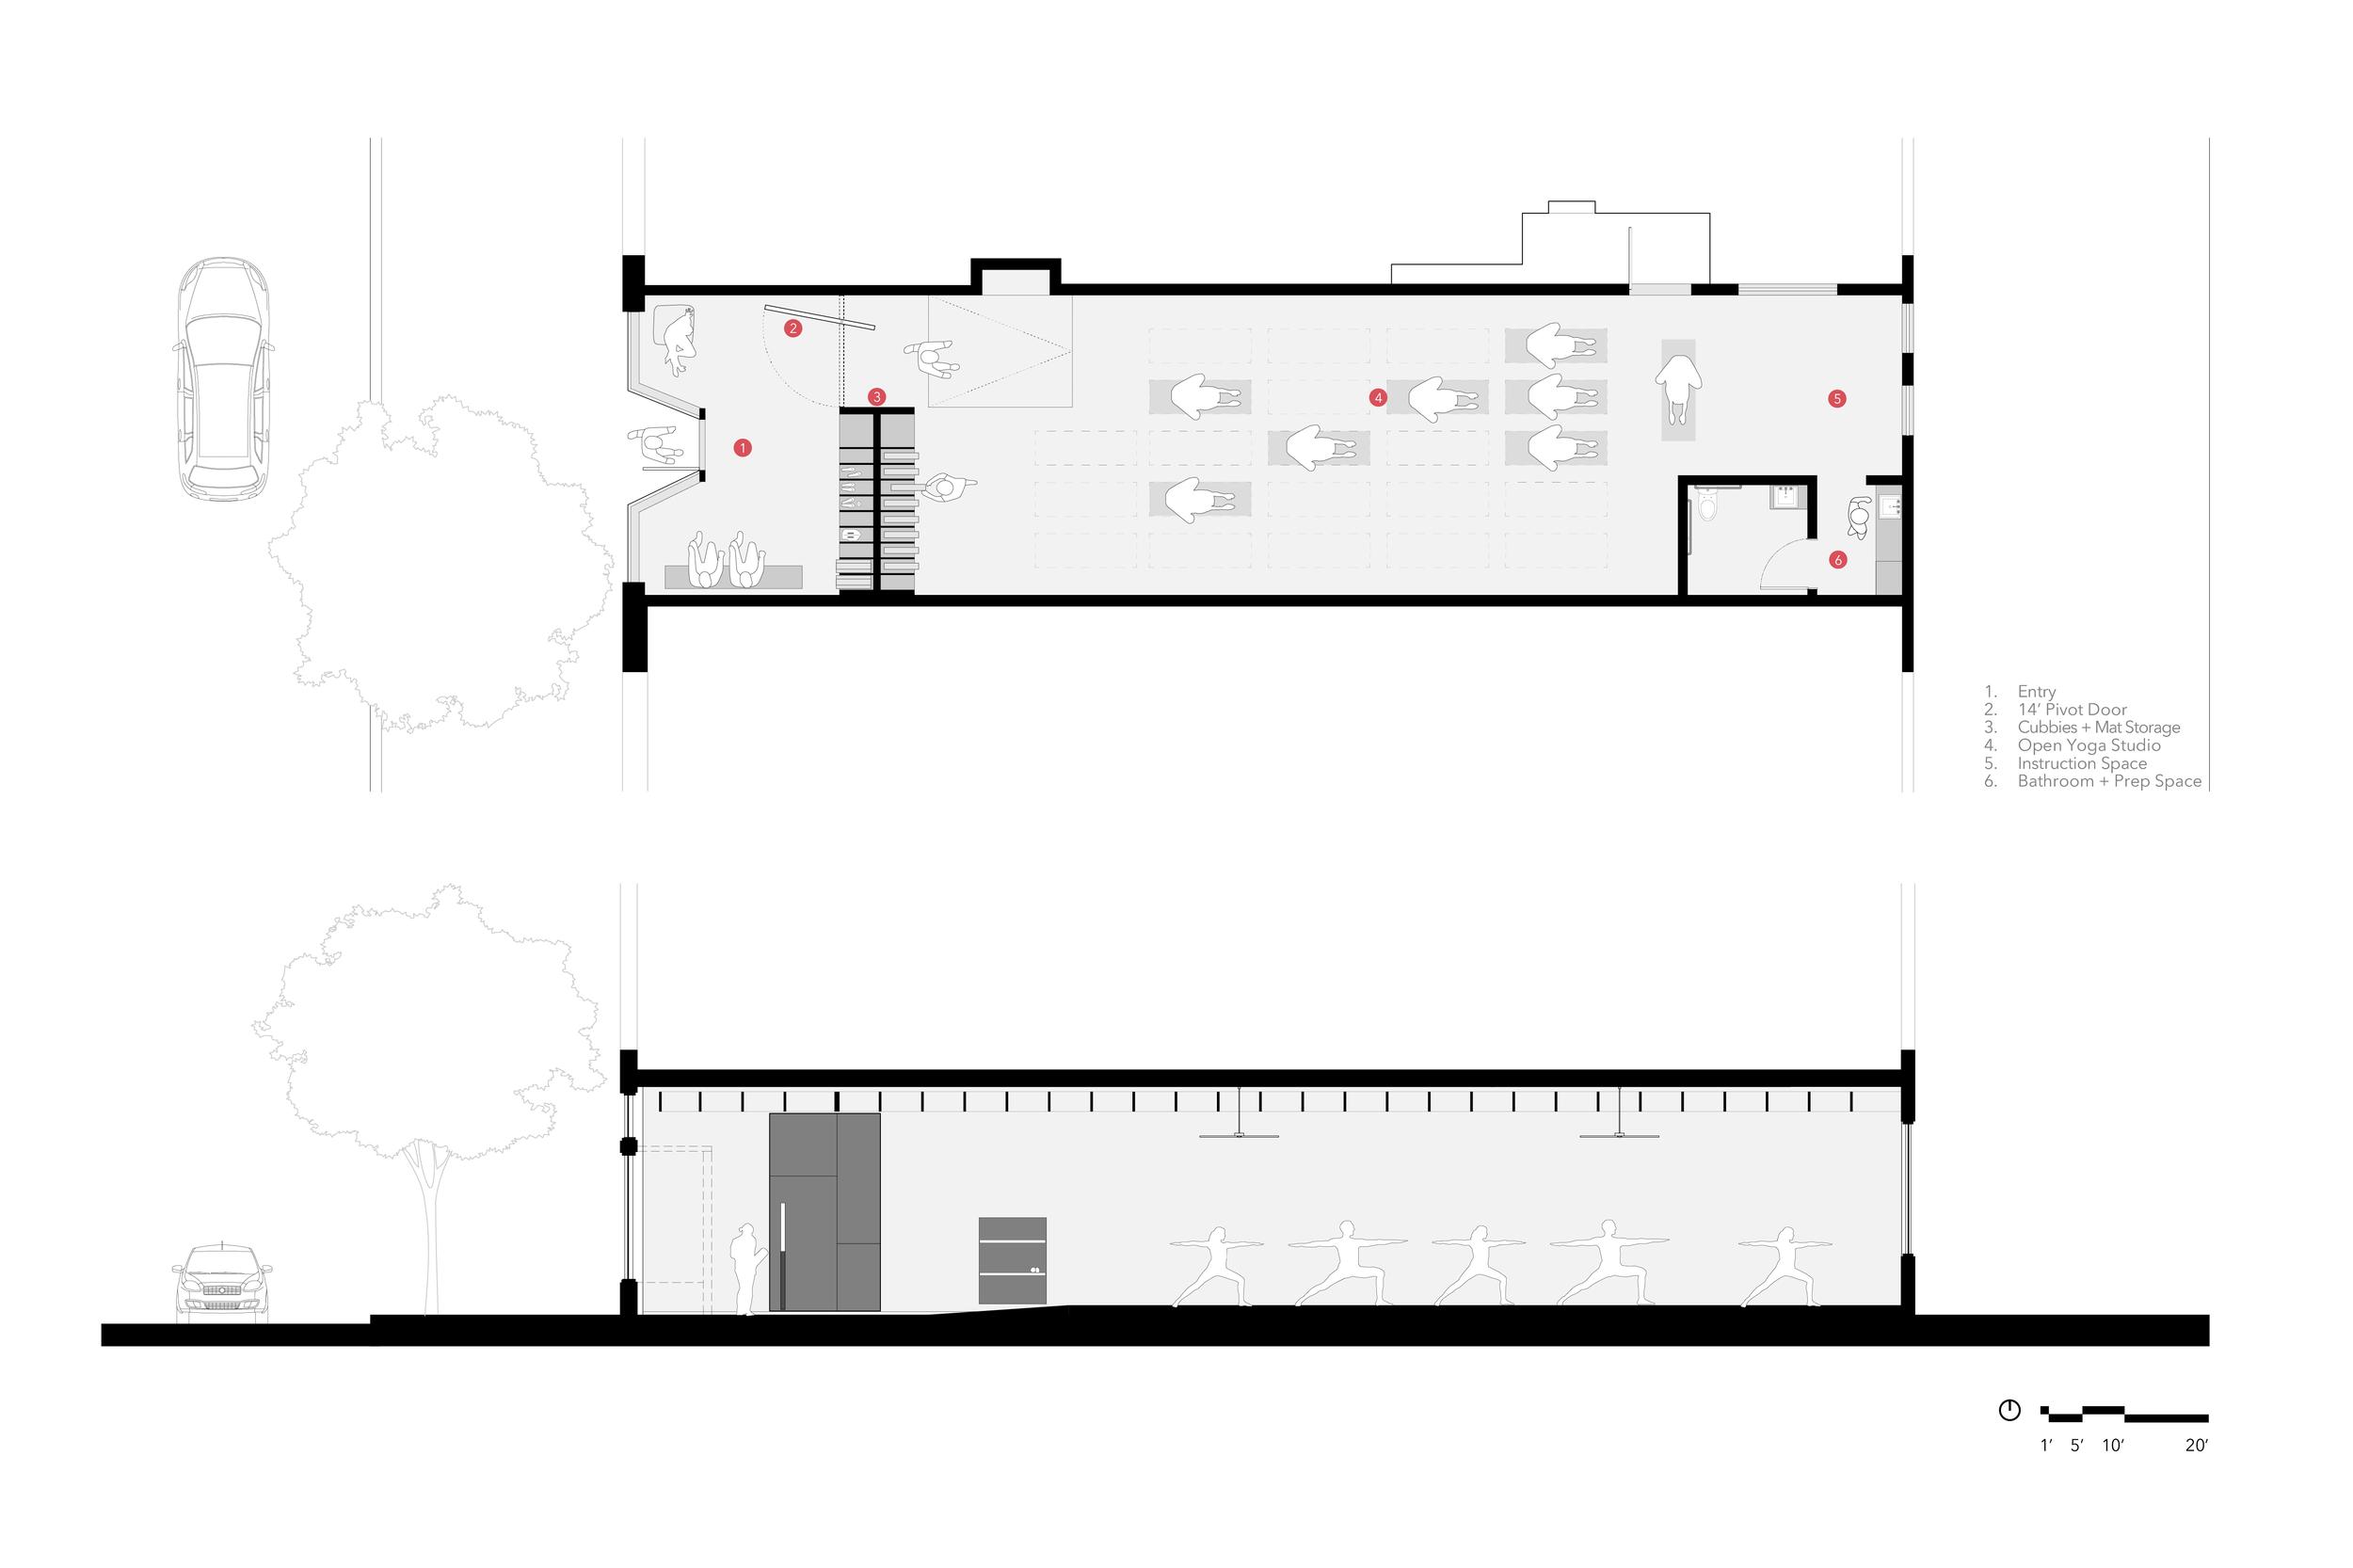 goCstudio_Ritual Room_Plan.png